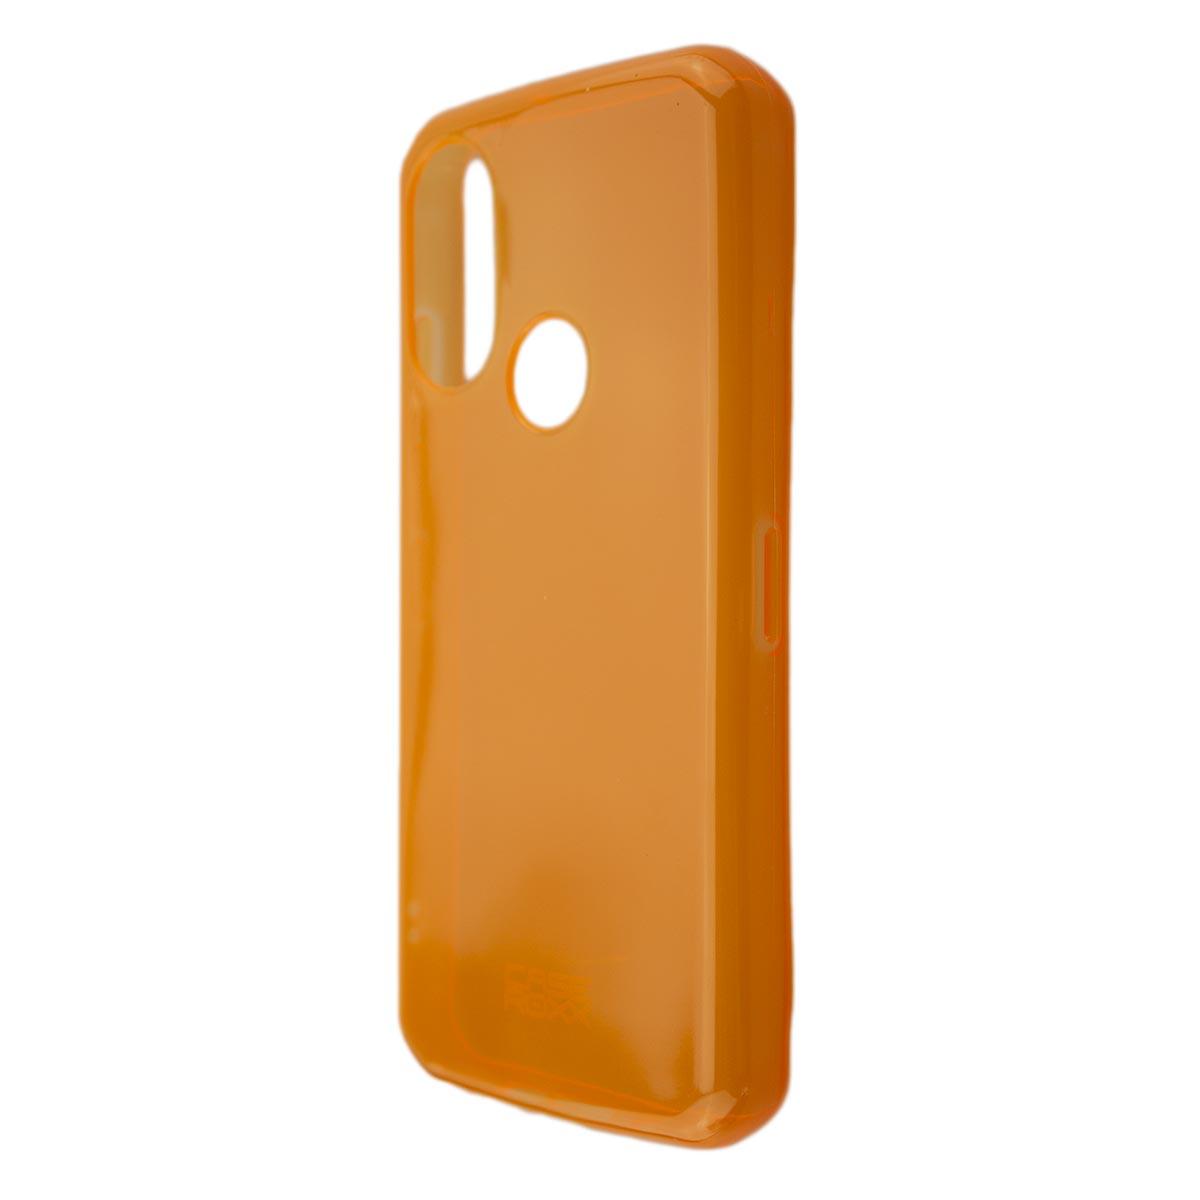 Caseroxx-TPU-Case-pour-Cat-S62-Pro-fait-de-TPU miniature 41